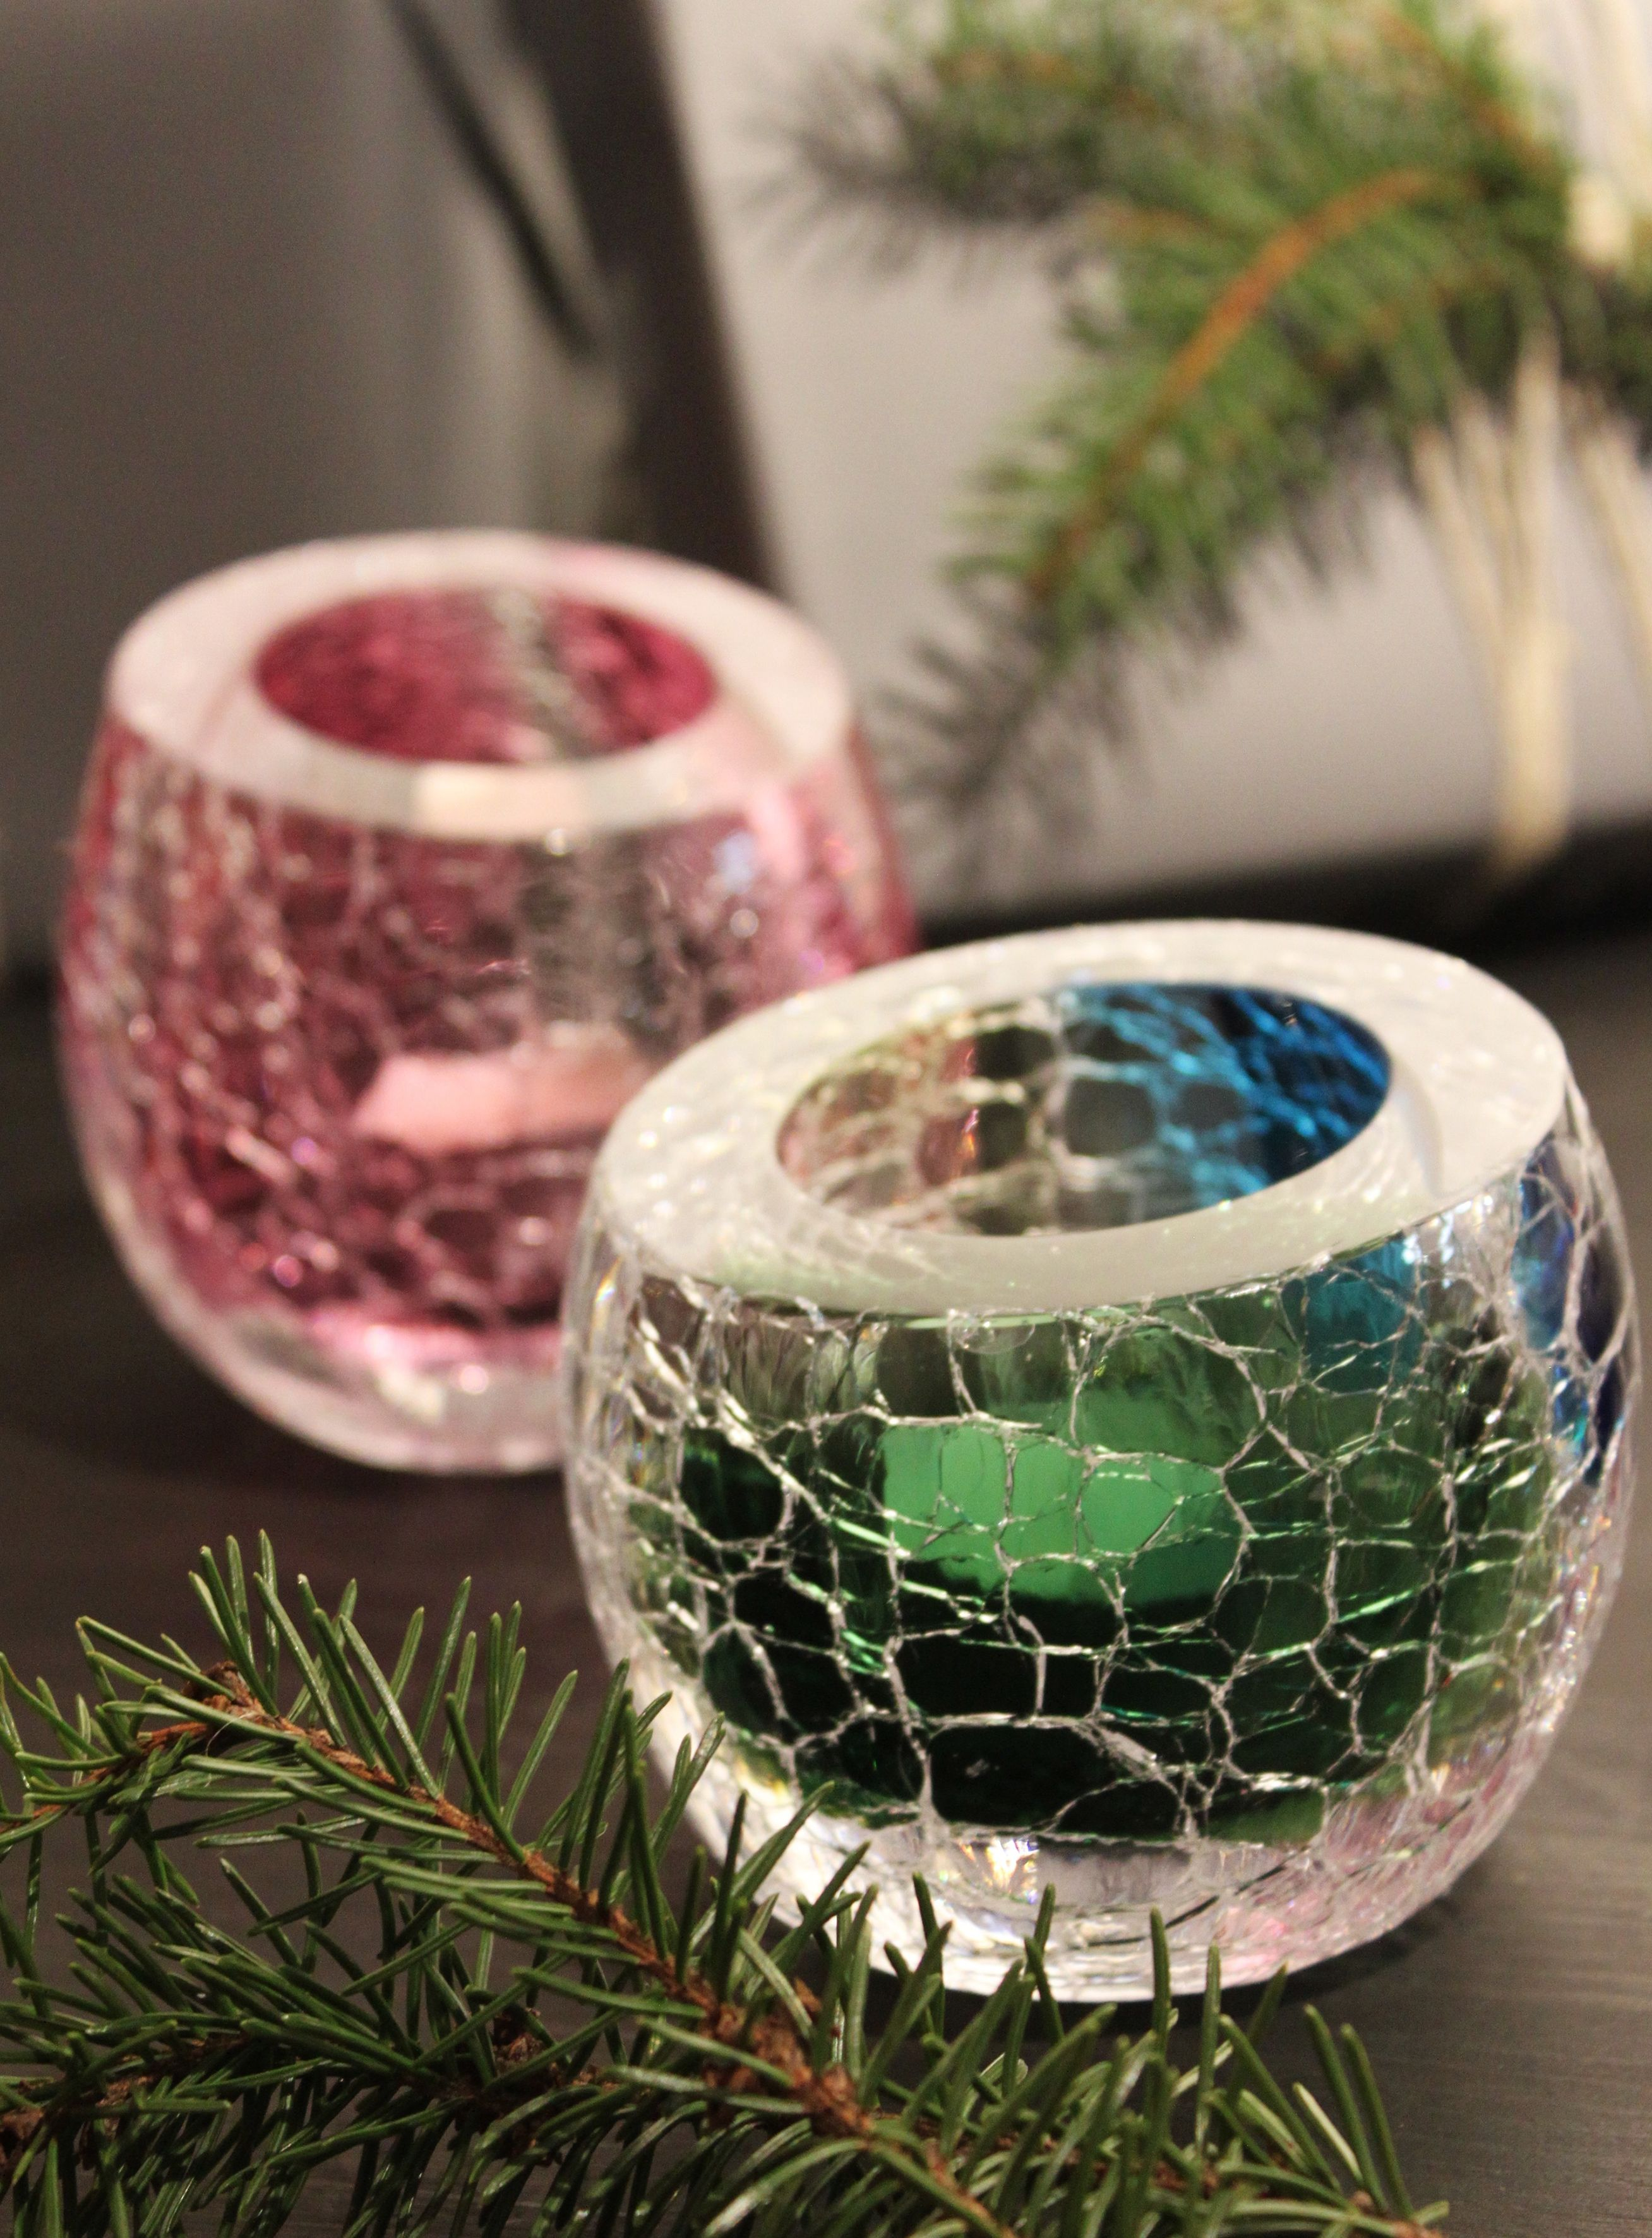 Crackle artworks by glass artist, master glassblower Kari Alakoski.